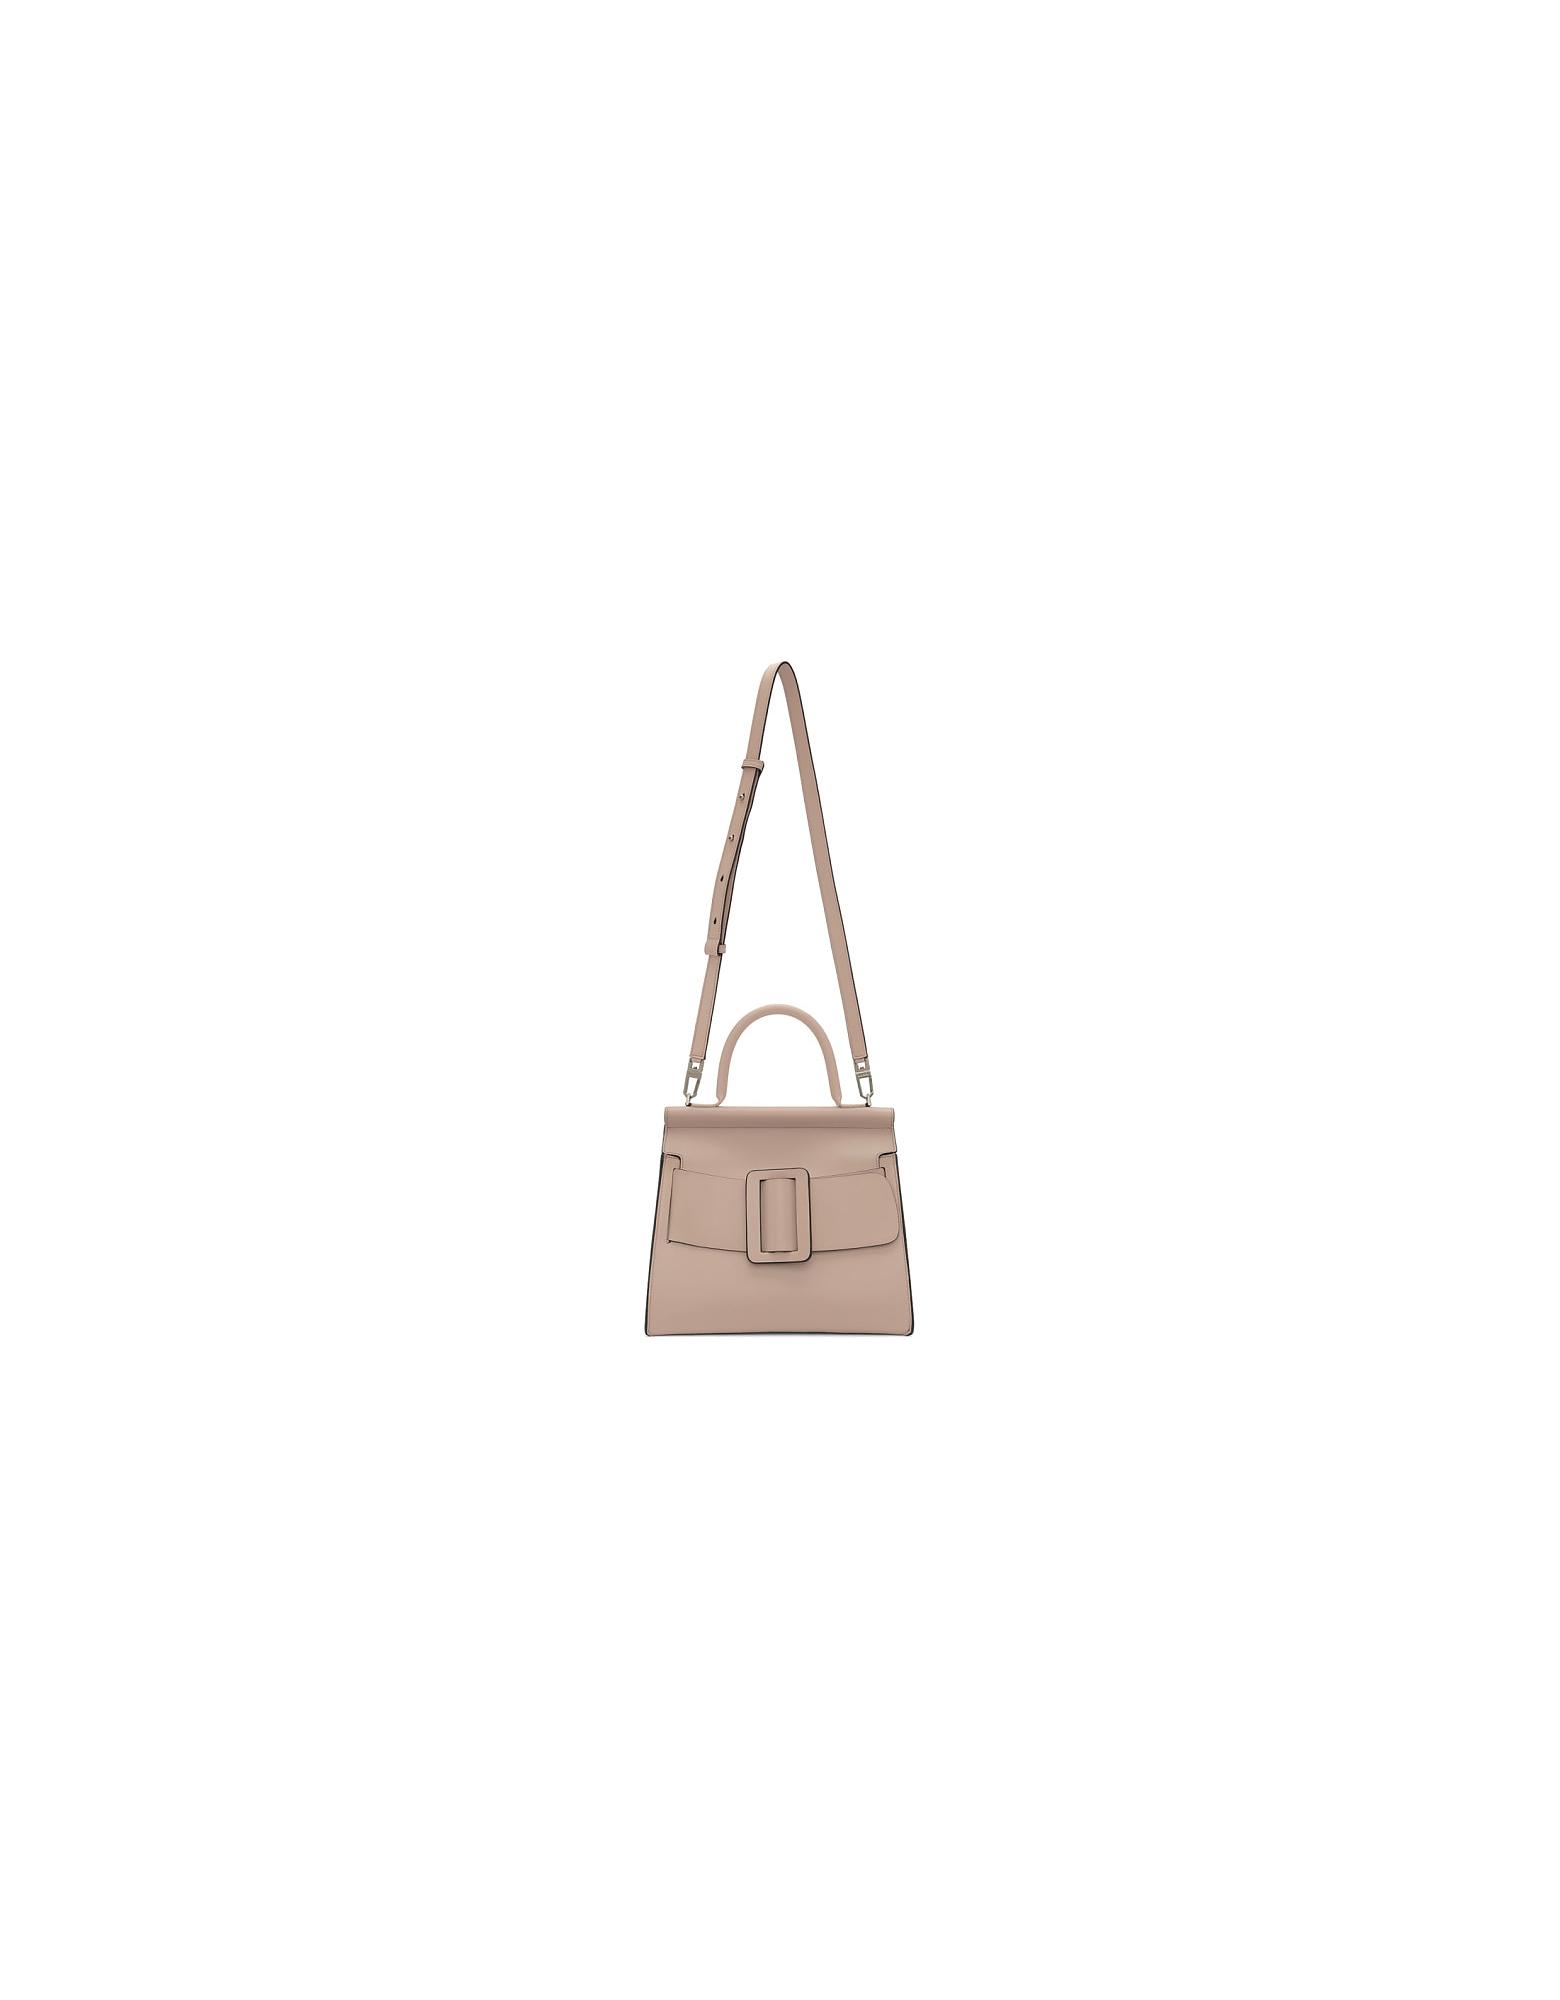 BOYY Designer Handbags, Pink Karl Bag